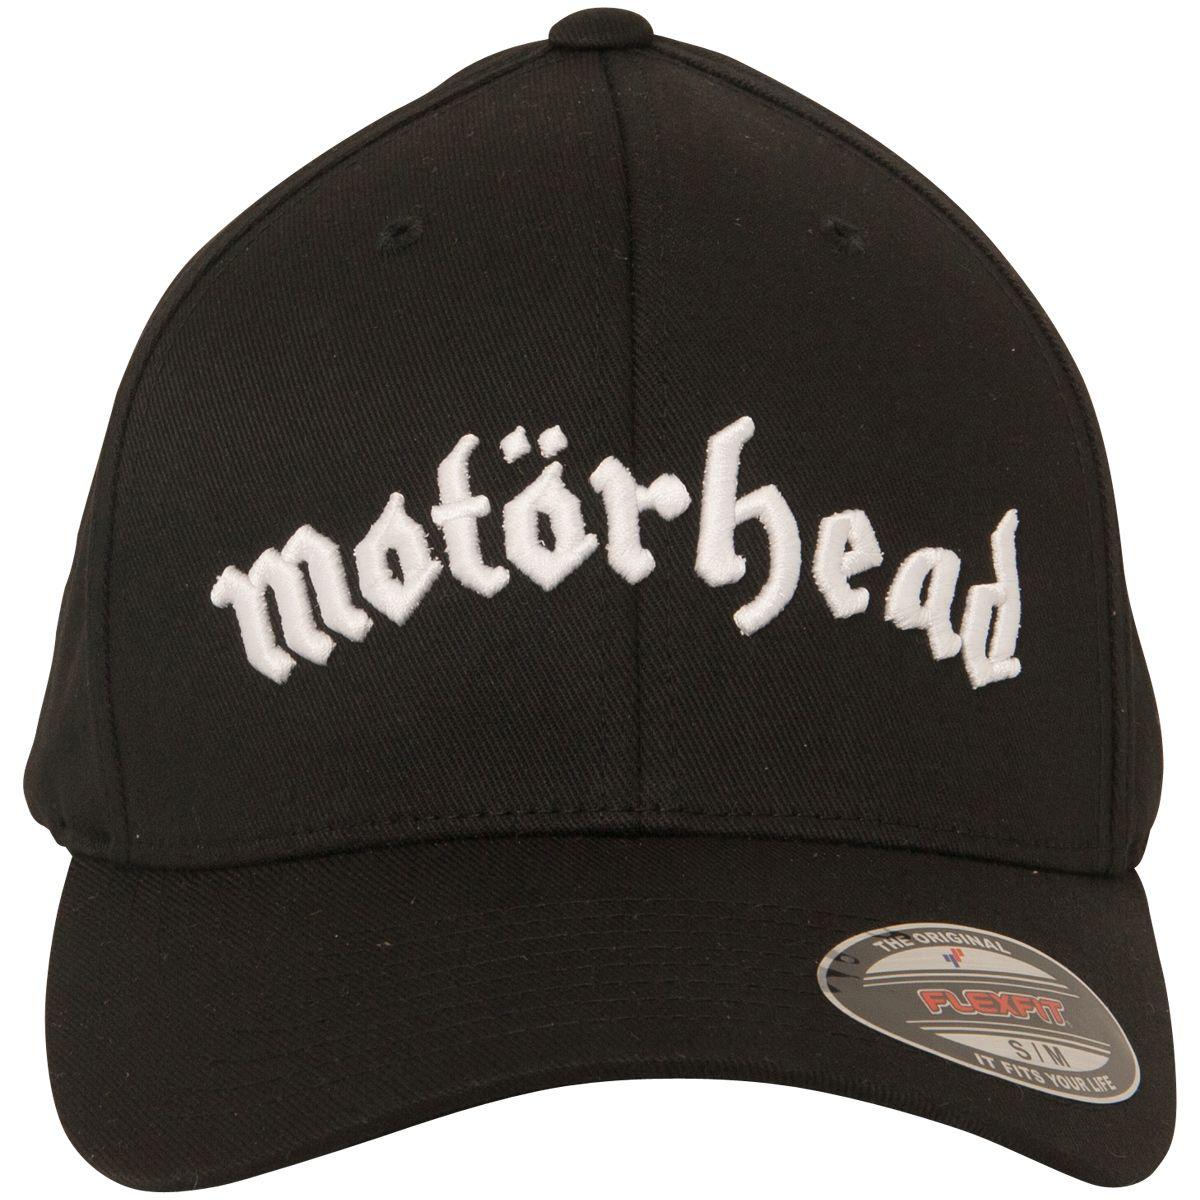 d463f64c435 Motörhead - Black Flexfit Cap with Band Logo